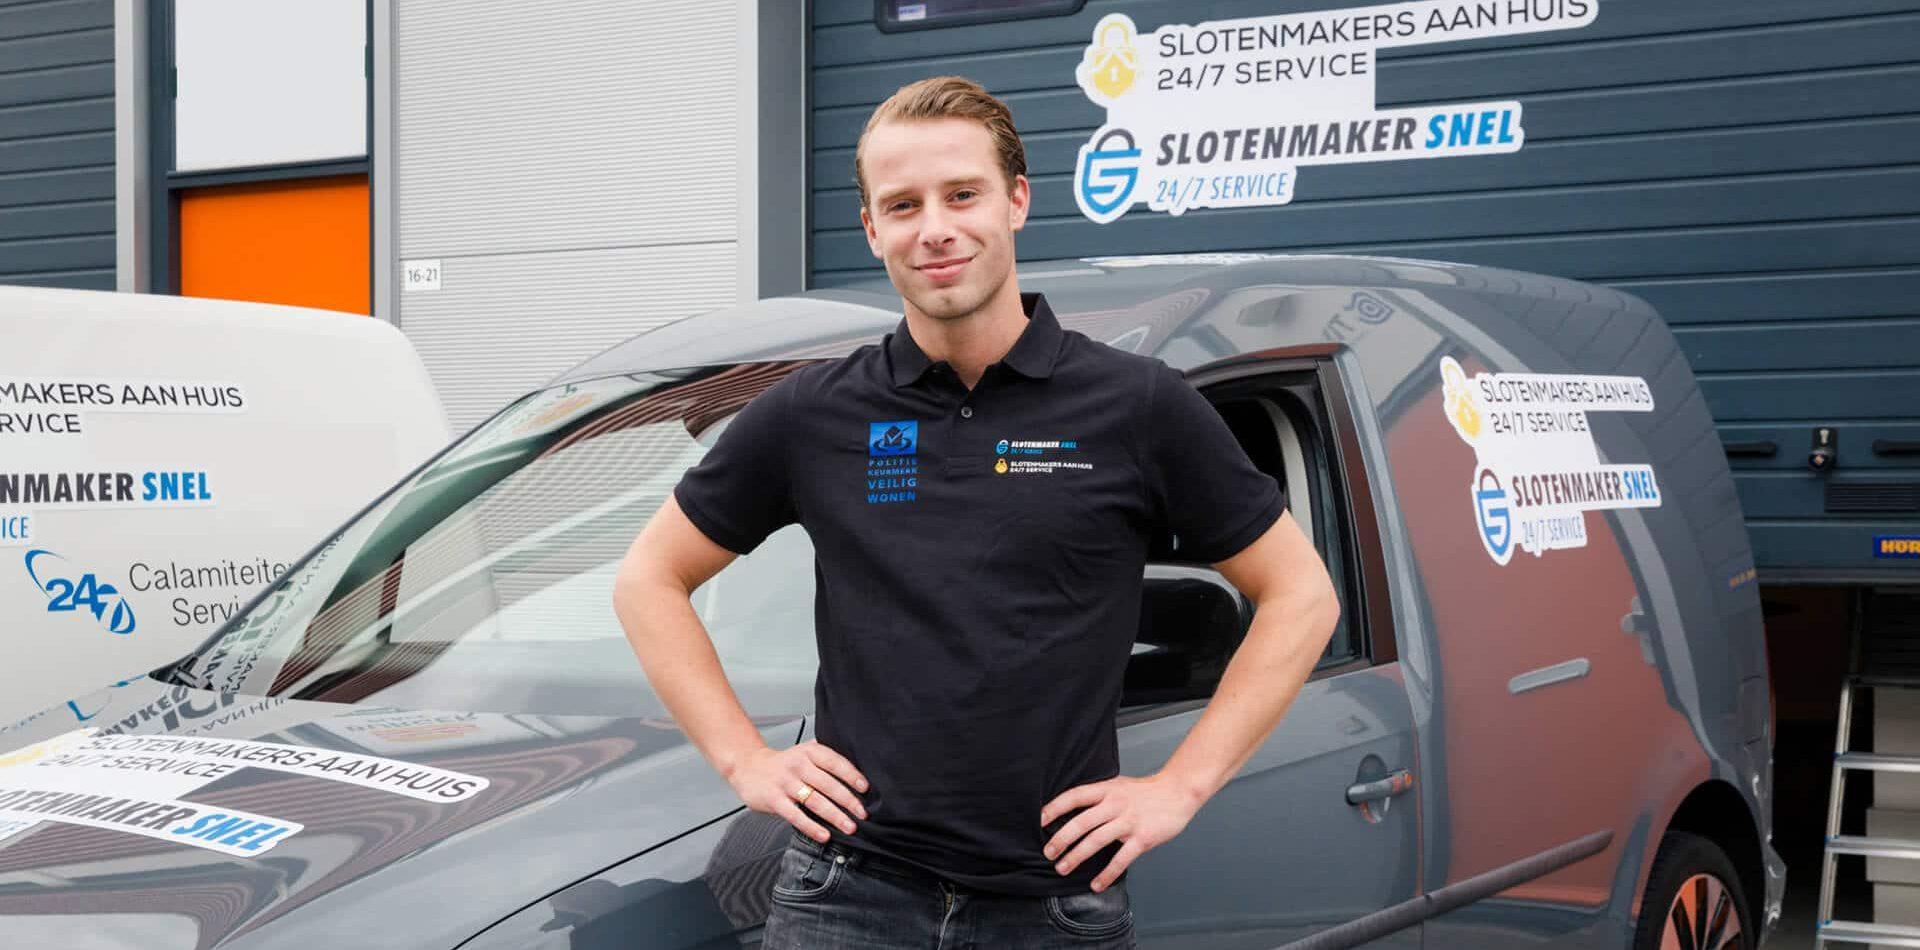 Slotenmaker Montfoort